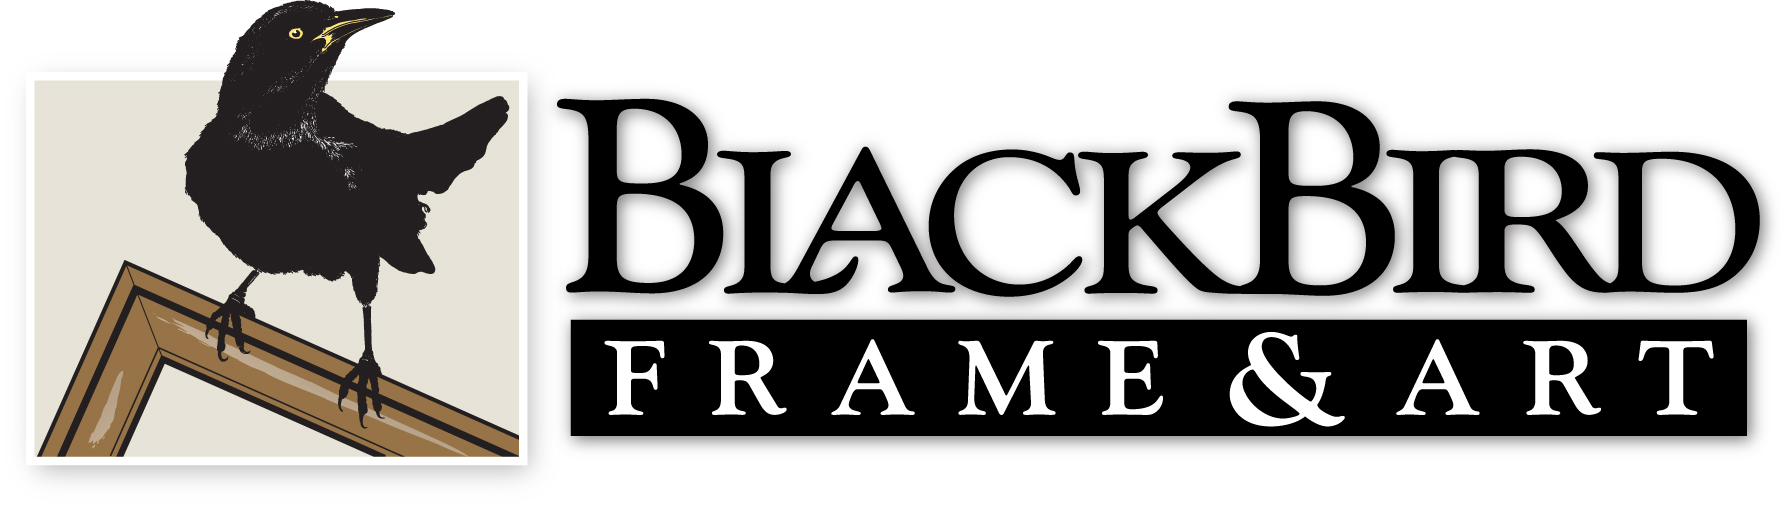 BB web logo LG.jpg